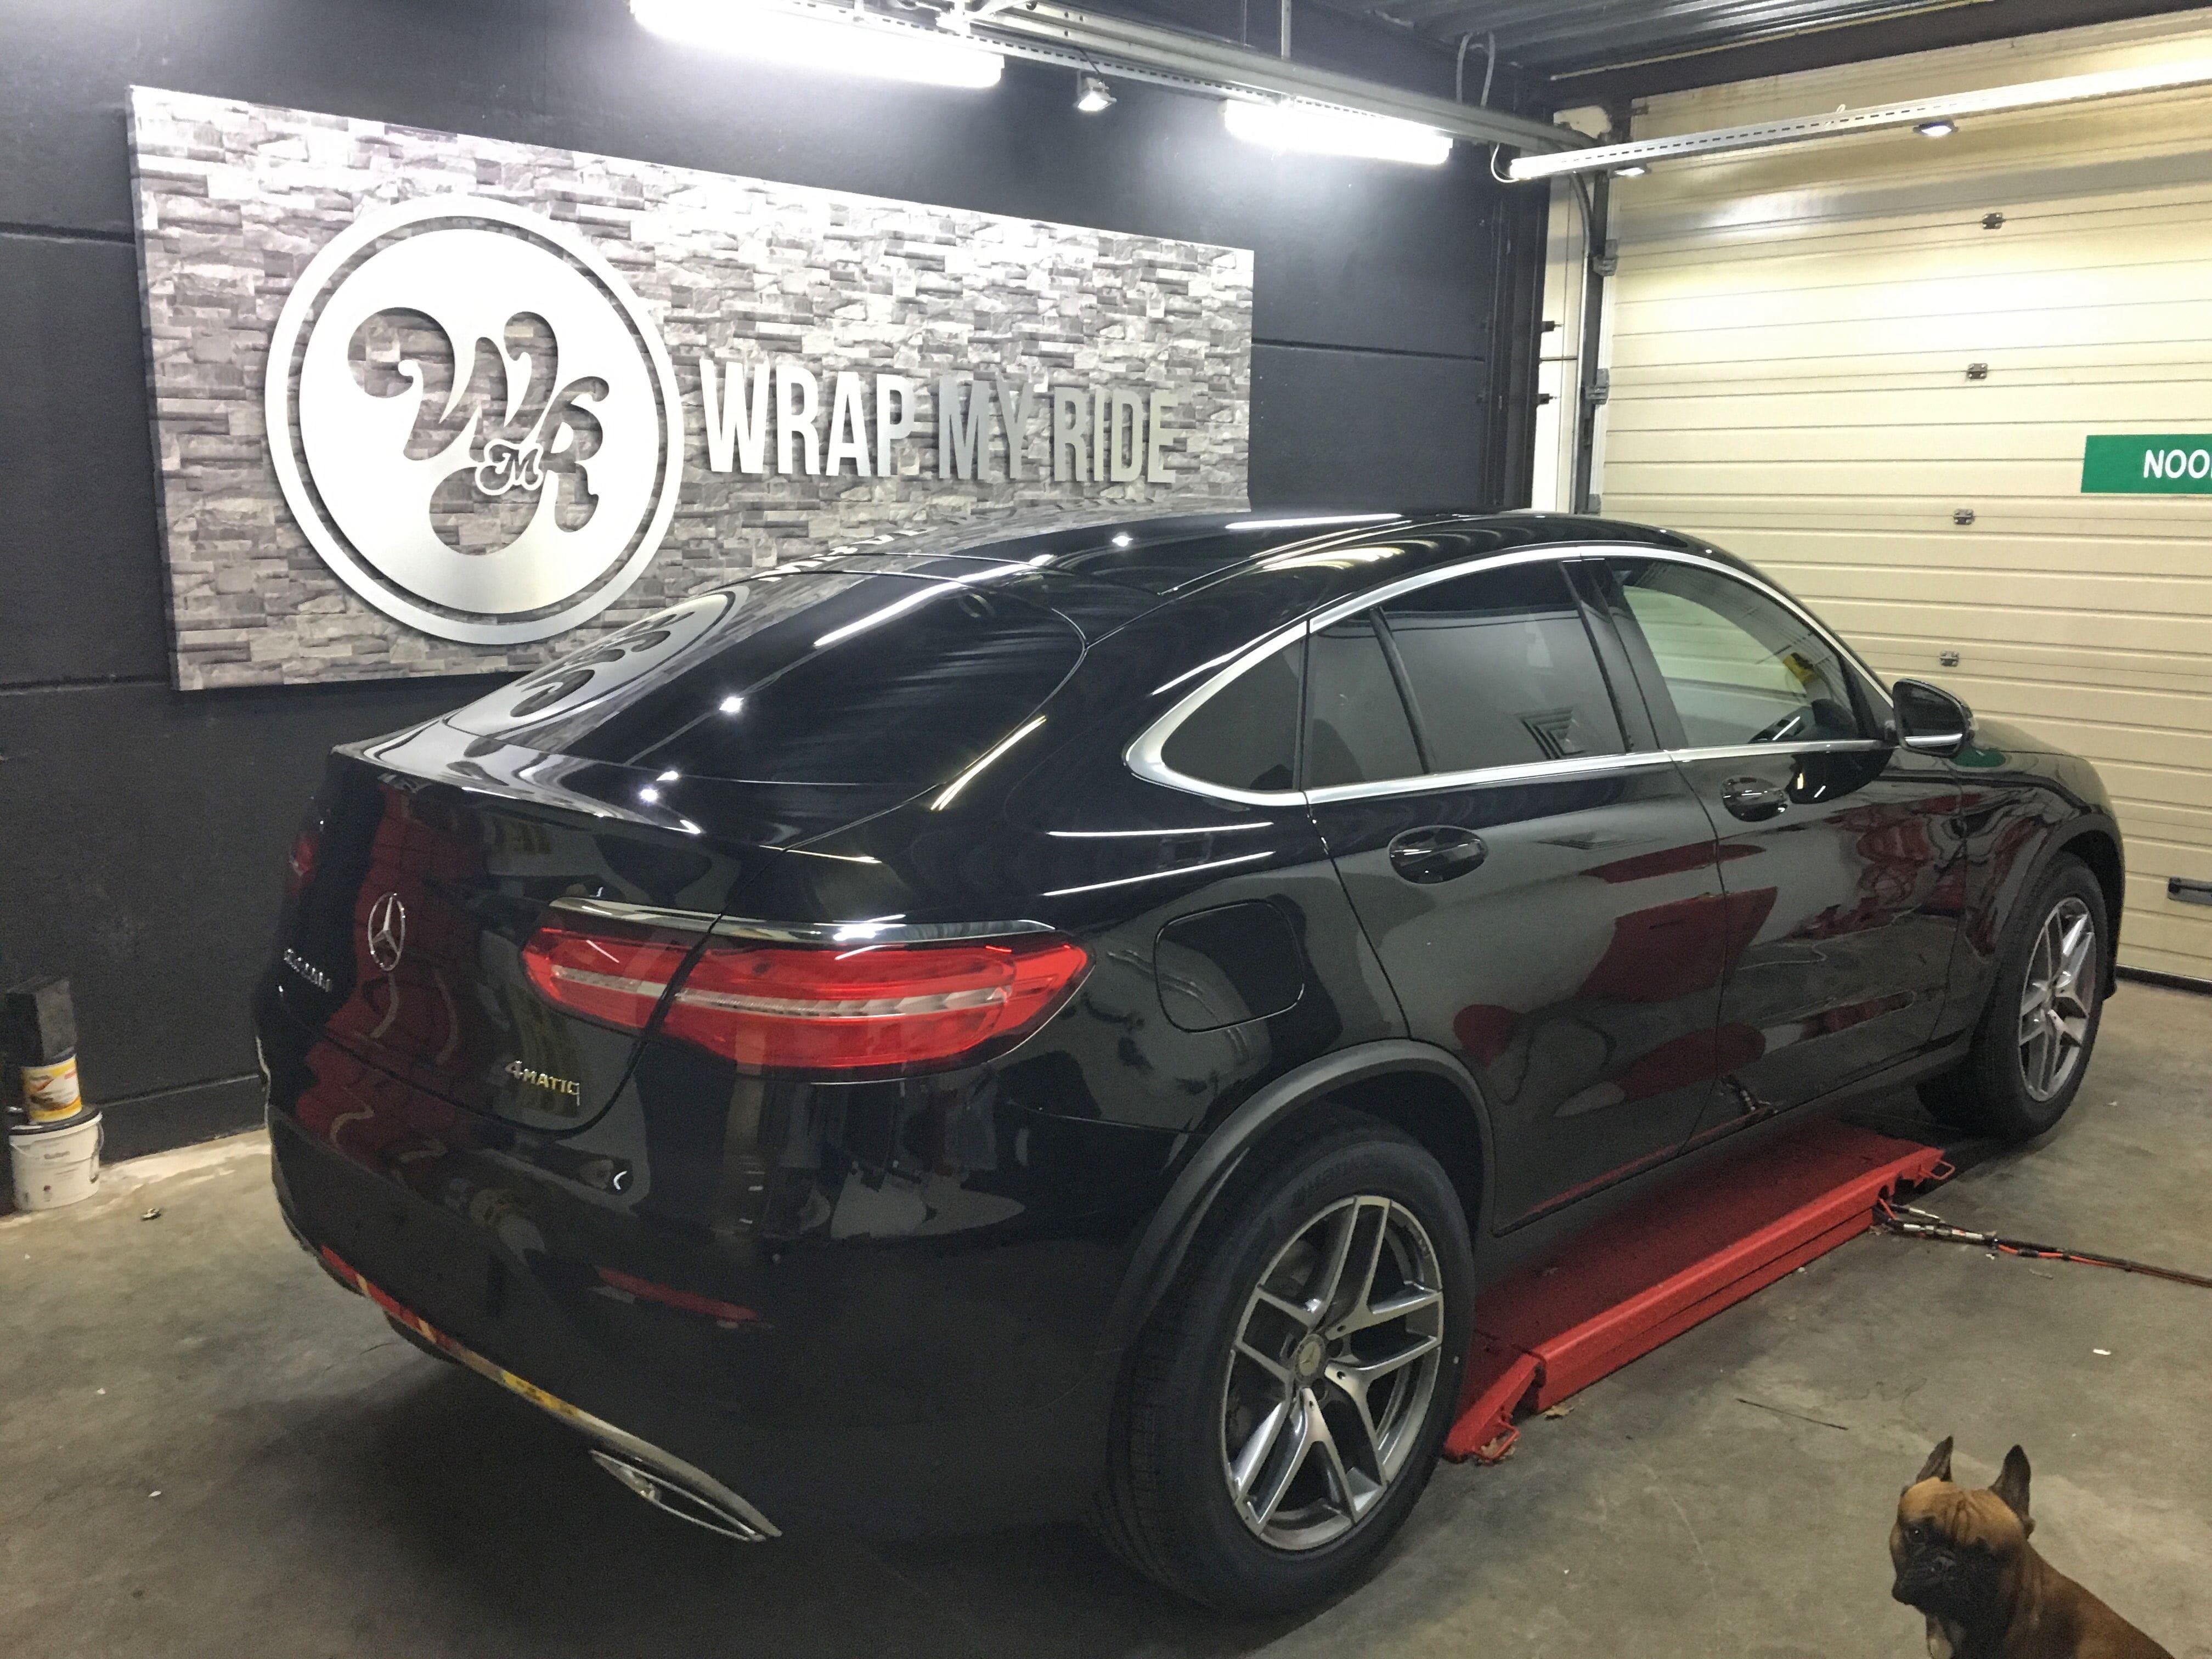 Mercedes GLC Coupe Matte metallic brown, Carwrapping door Wrapmyride.nu Foto-nr:9383, ©2021